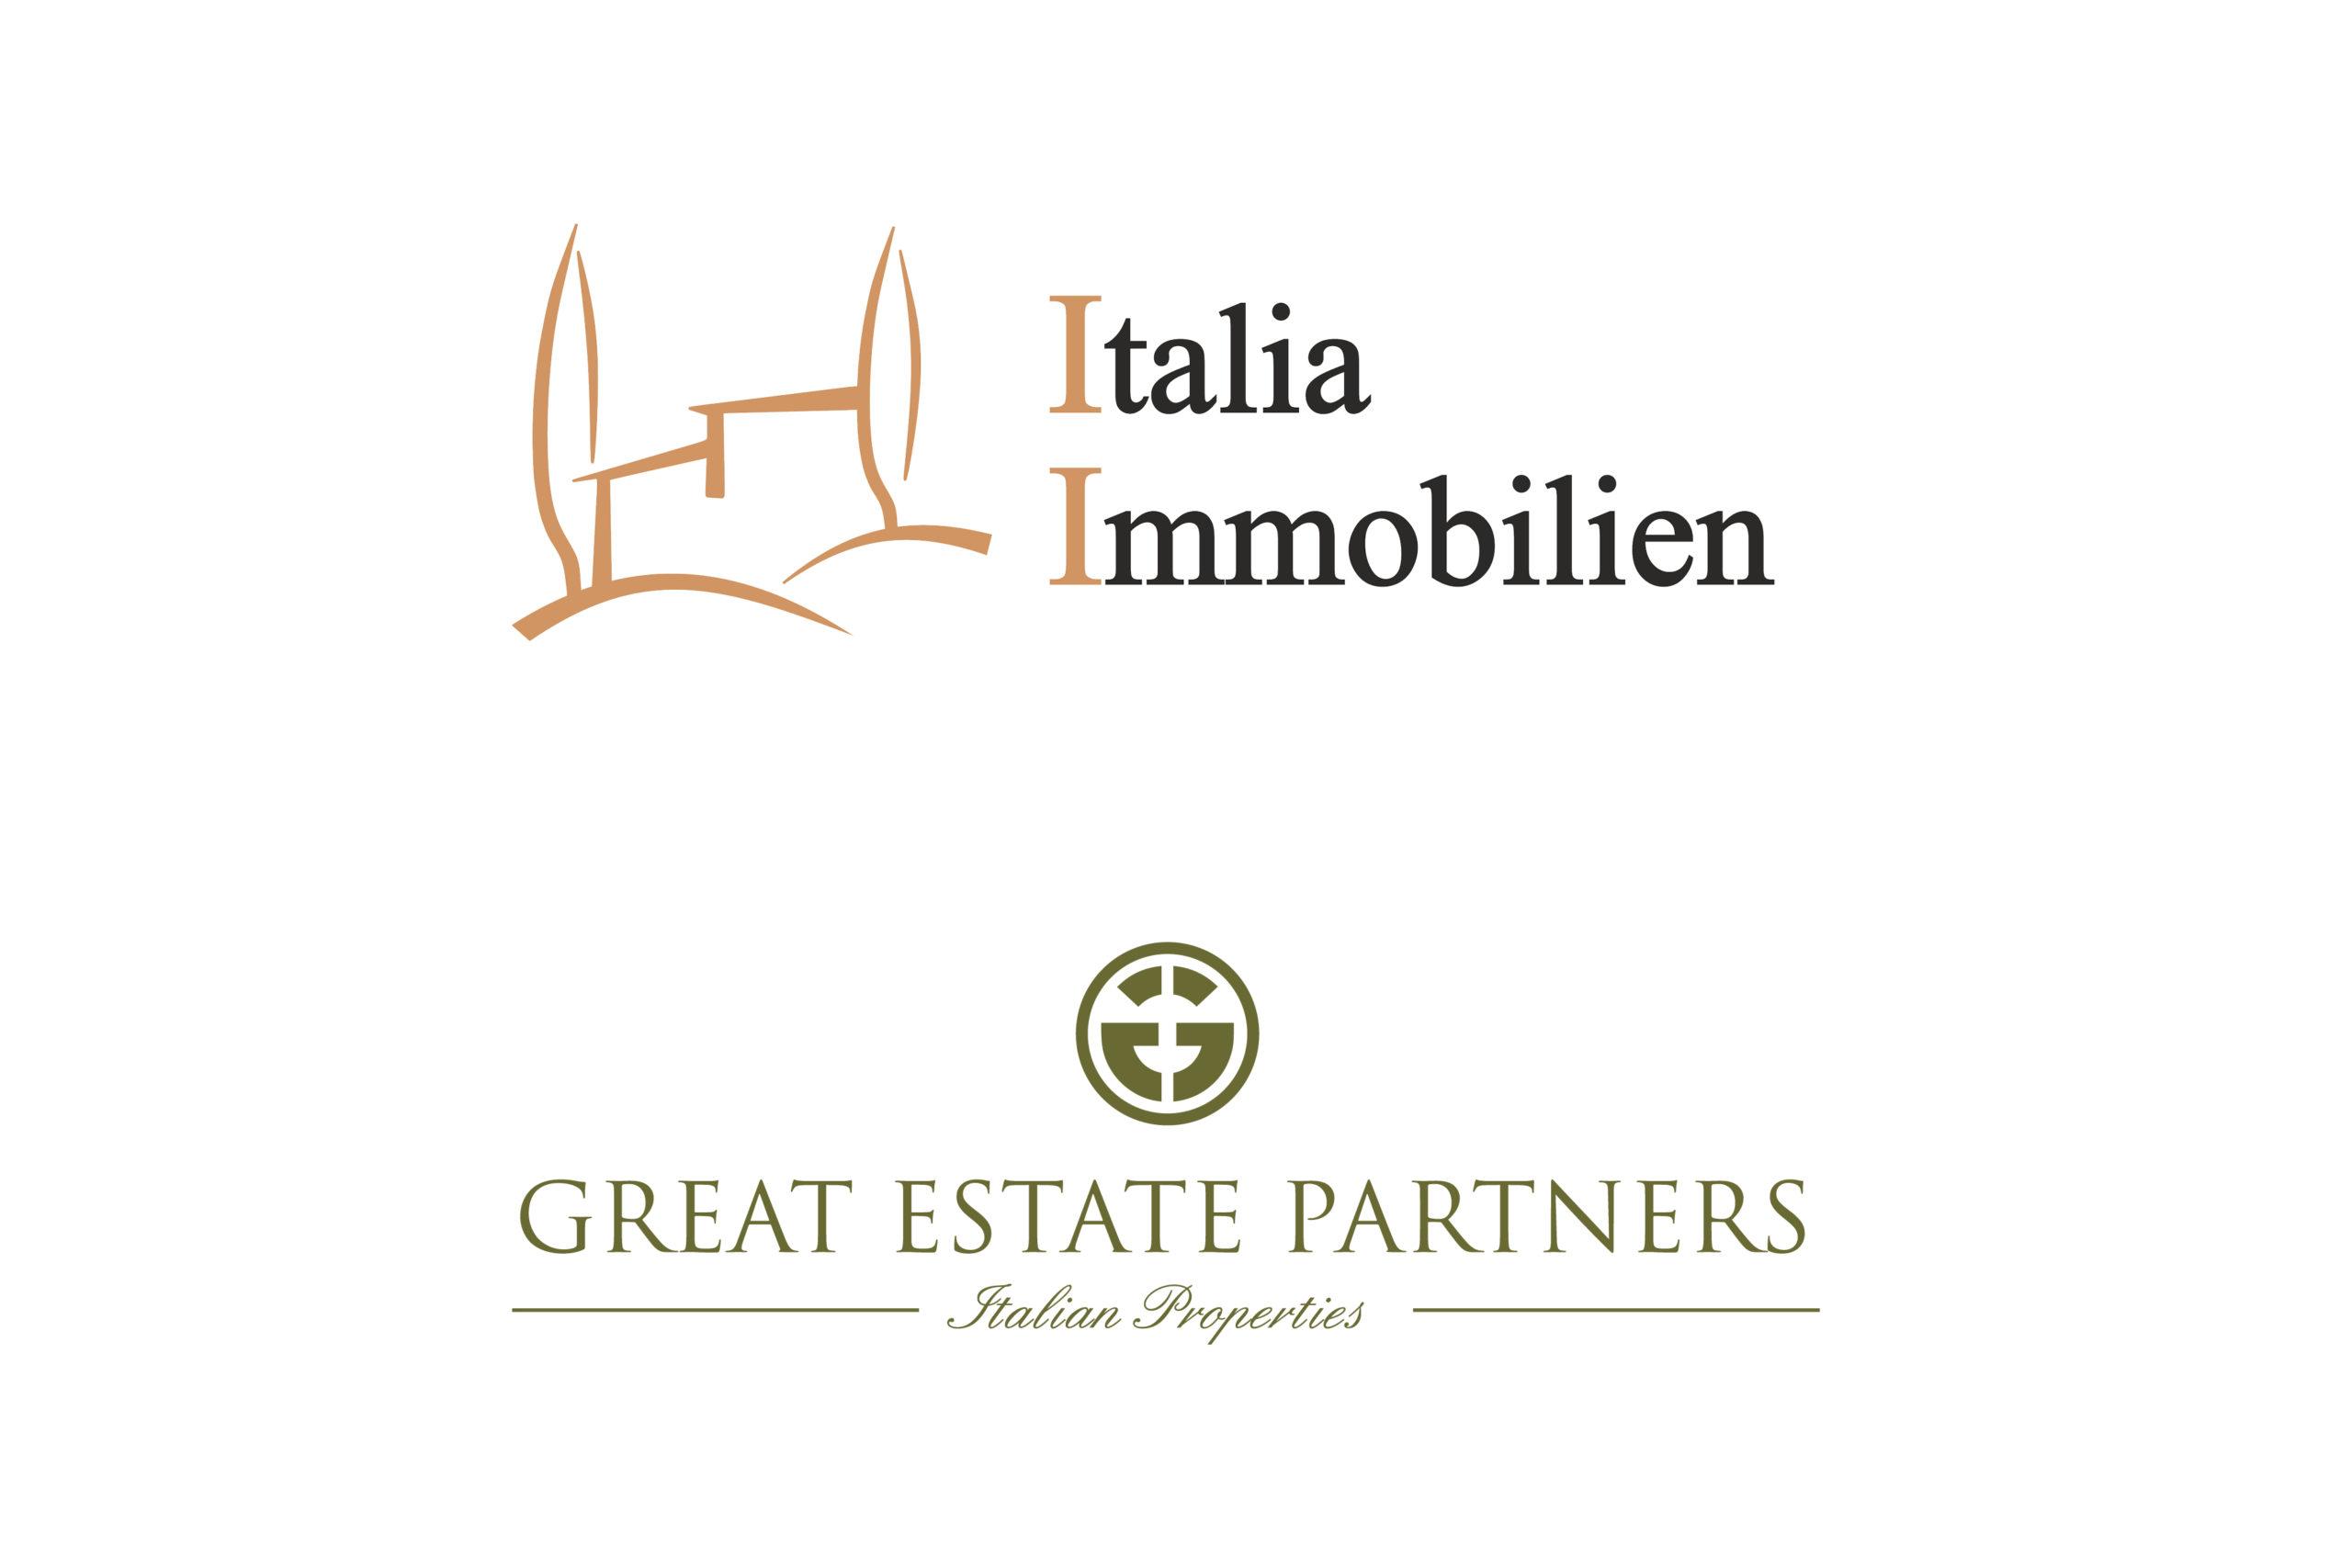 Плодотворное сотрудничество GREAT ESTATE NETWORK И ITALIA IMMOBILIEN